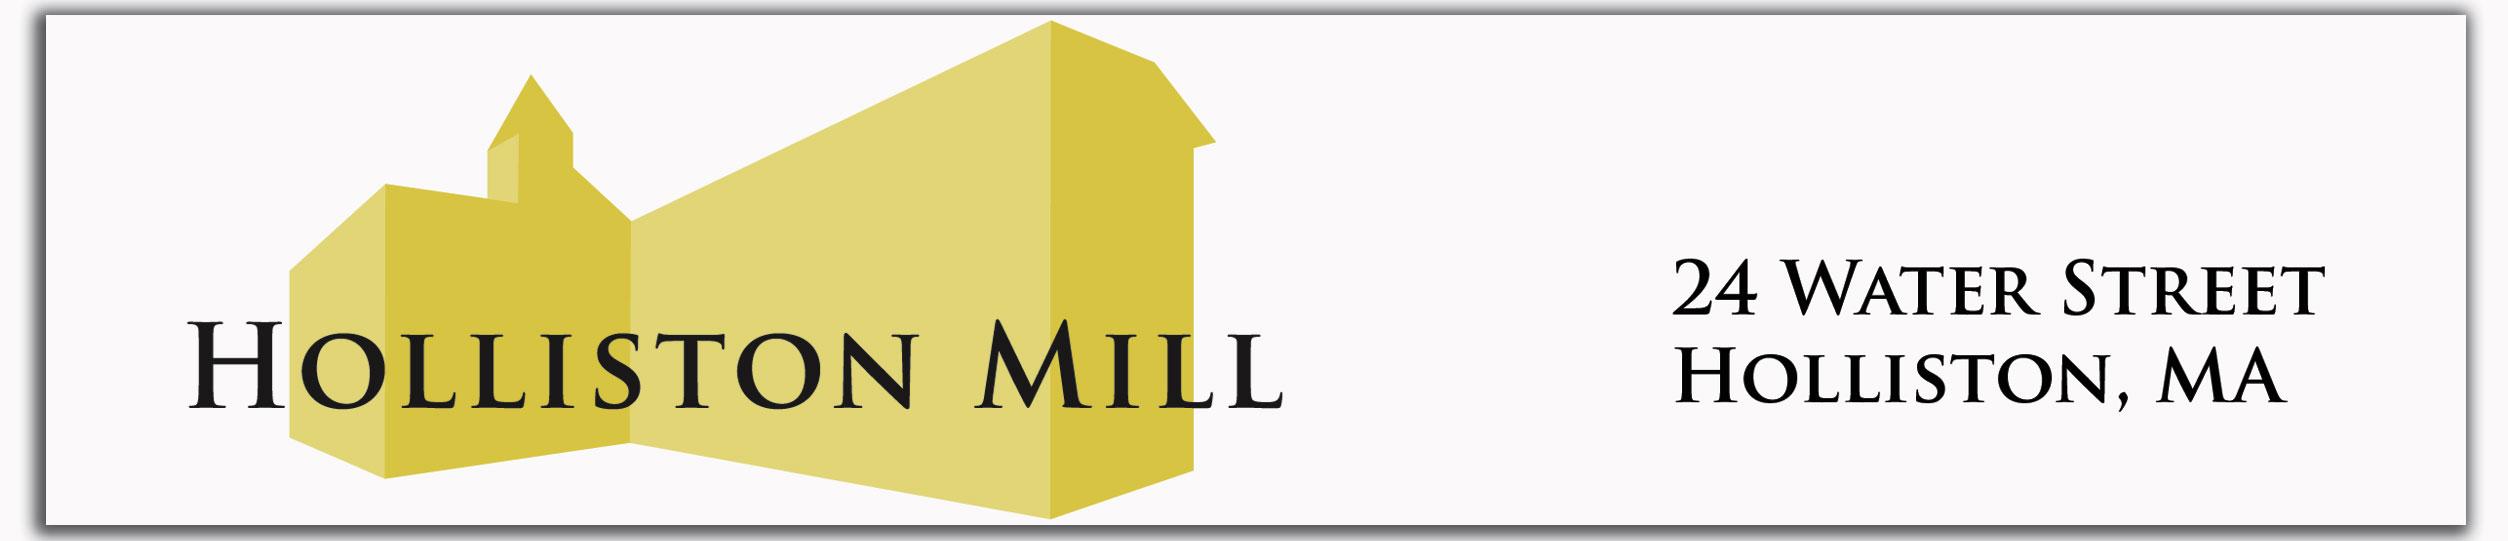 mill-logo-Addrs-Shdw